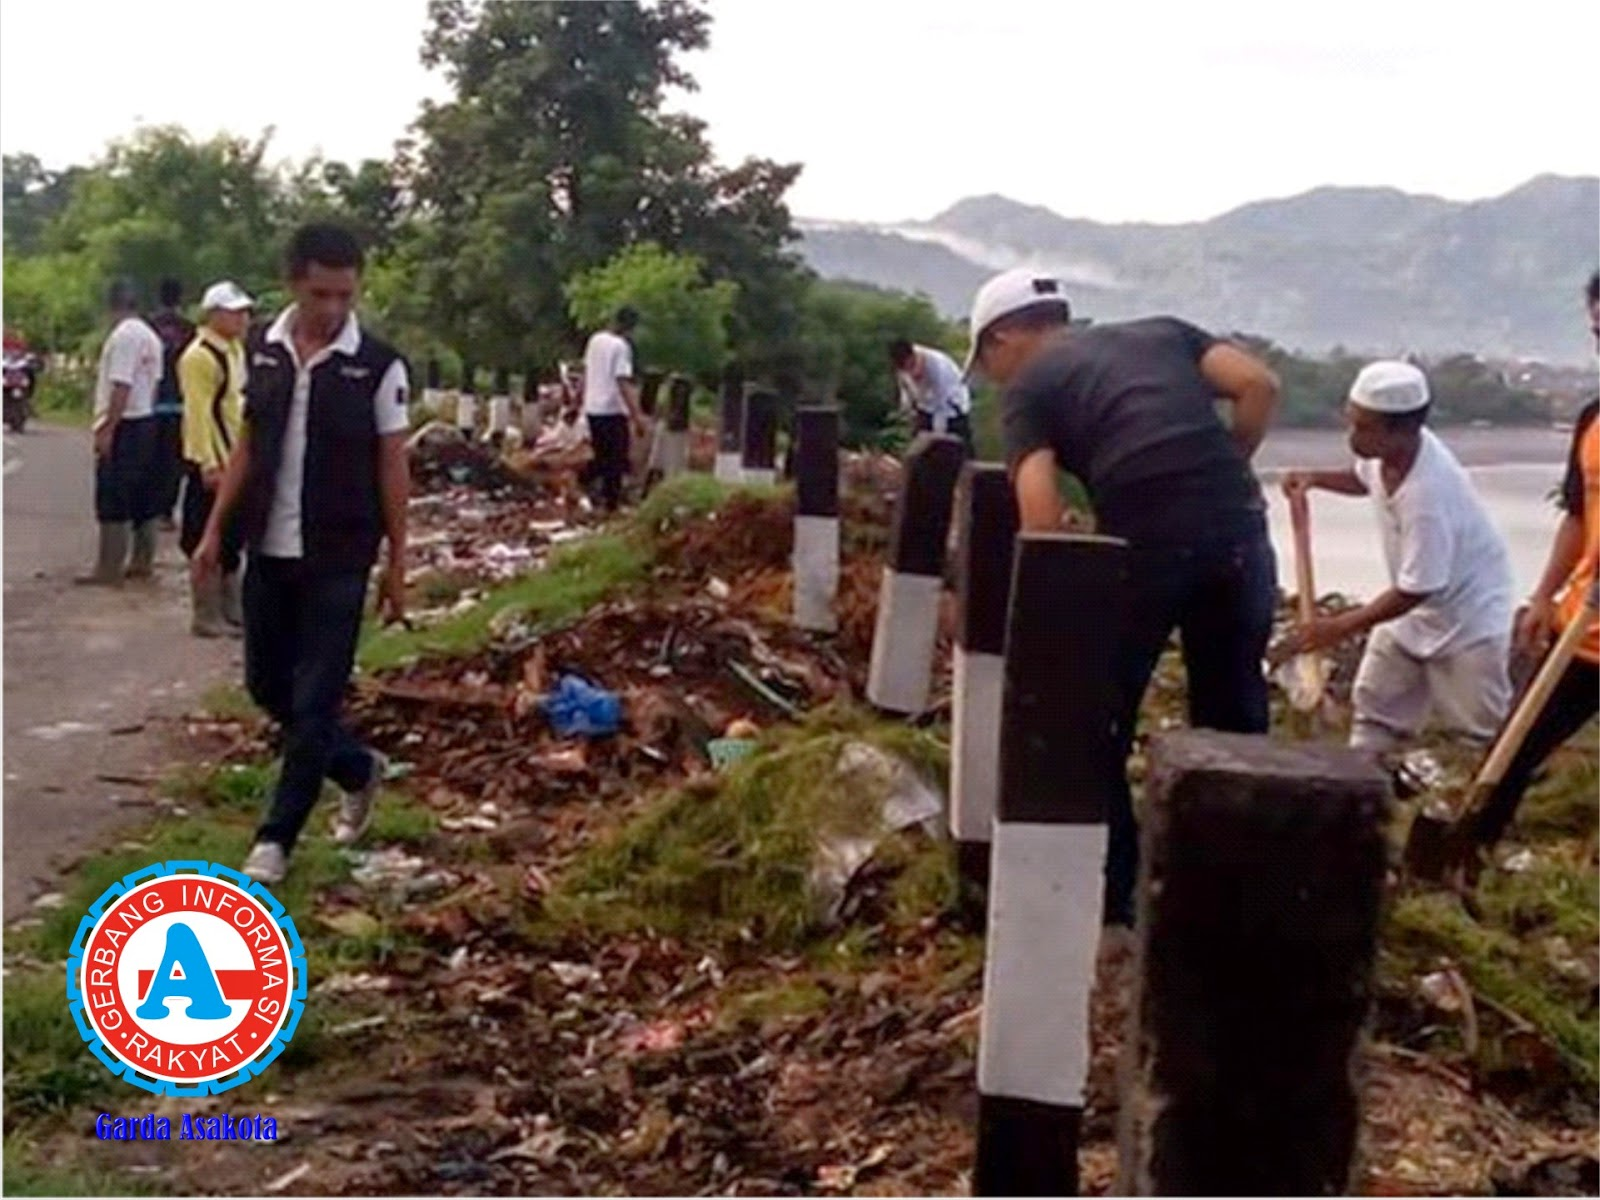 Sampah Menumpuk, Sekcam Asakota Pimpin Gotong-Royong